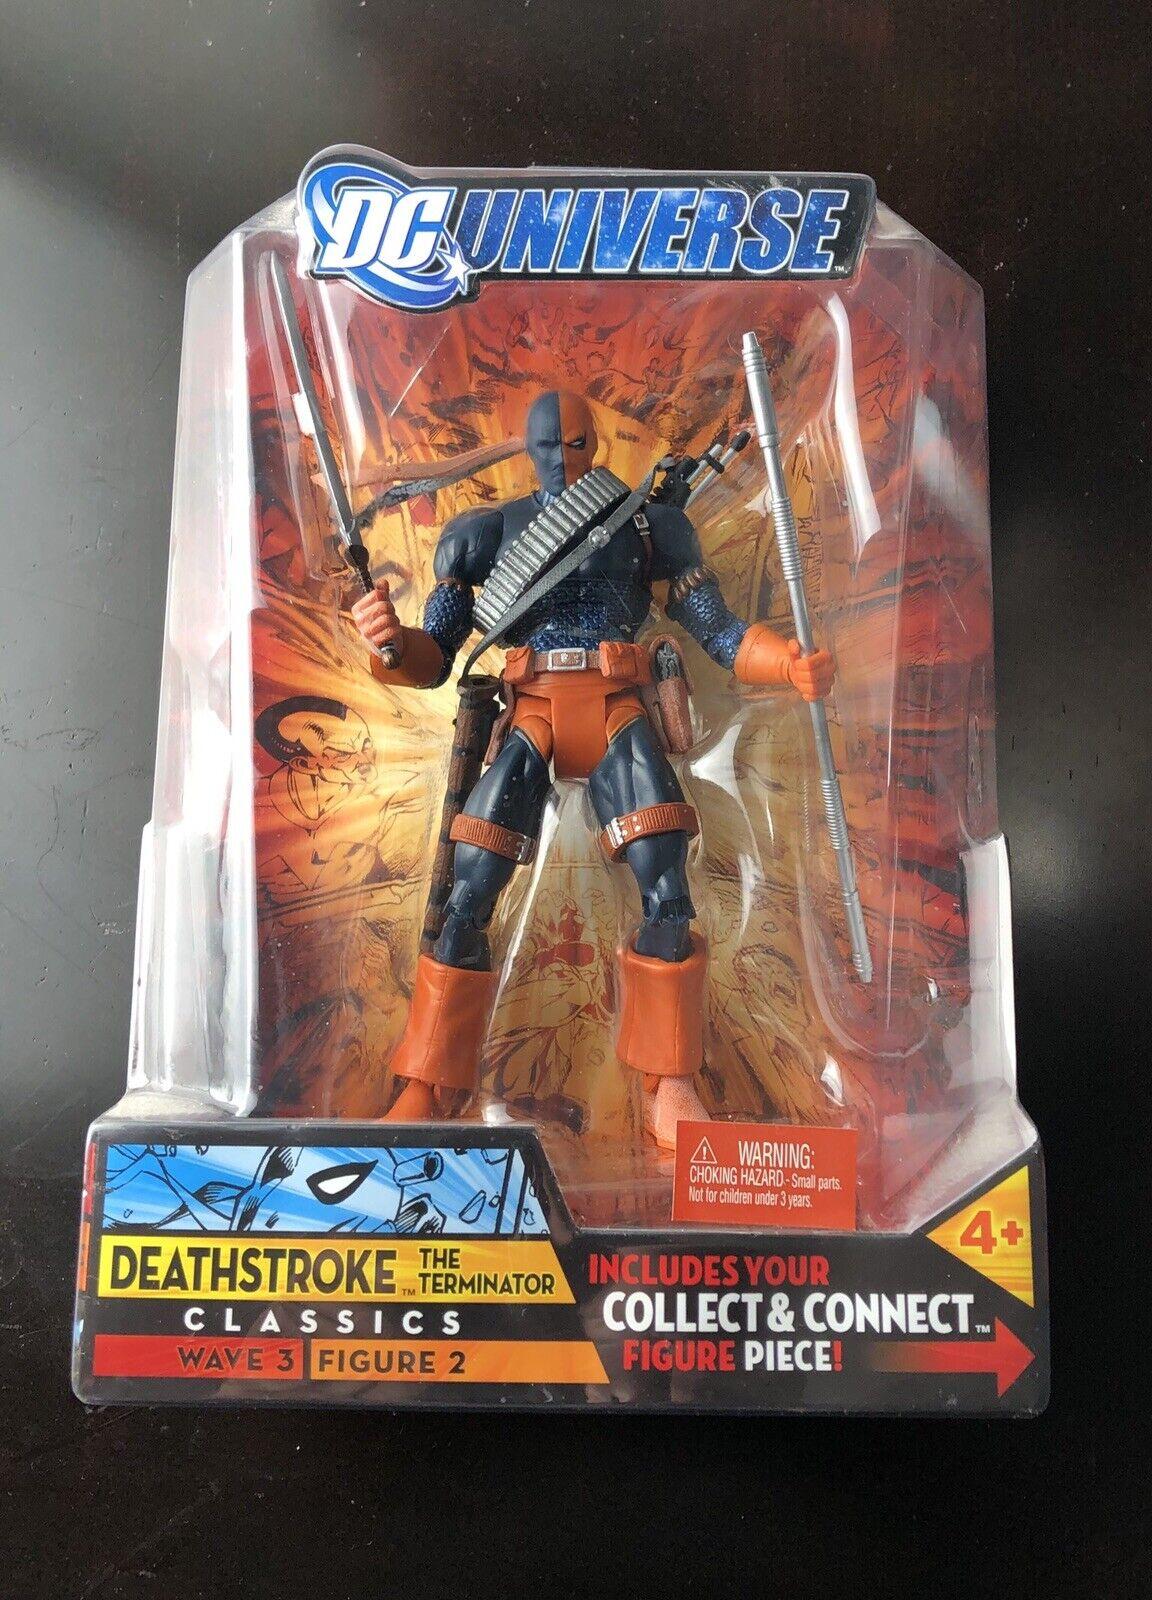 DC Universe Classics Wave 3 Deathstroke The Terminator Figura De Acción enmasCocheada ()